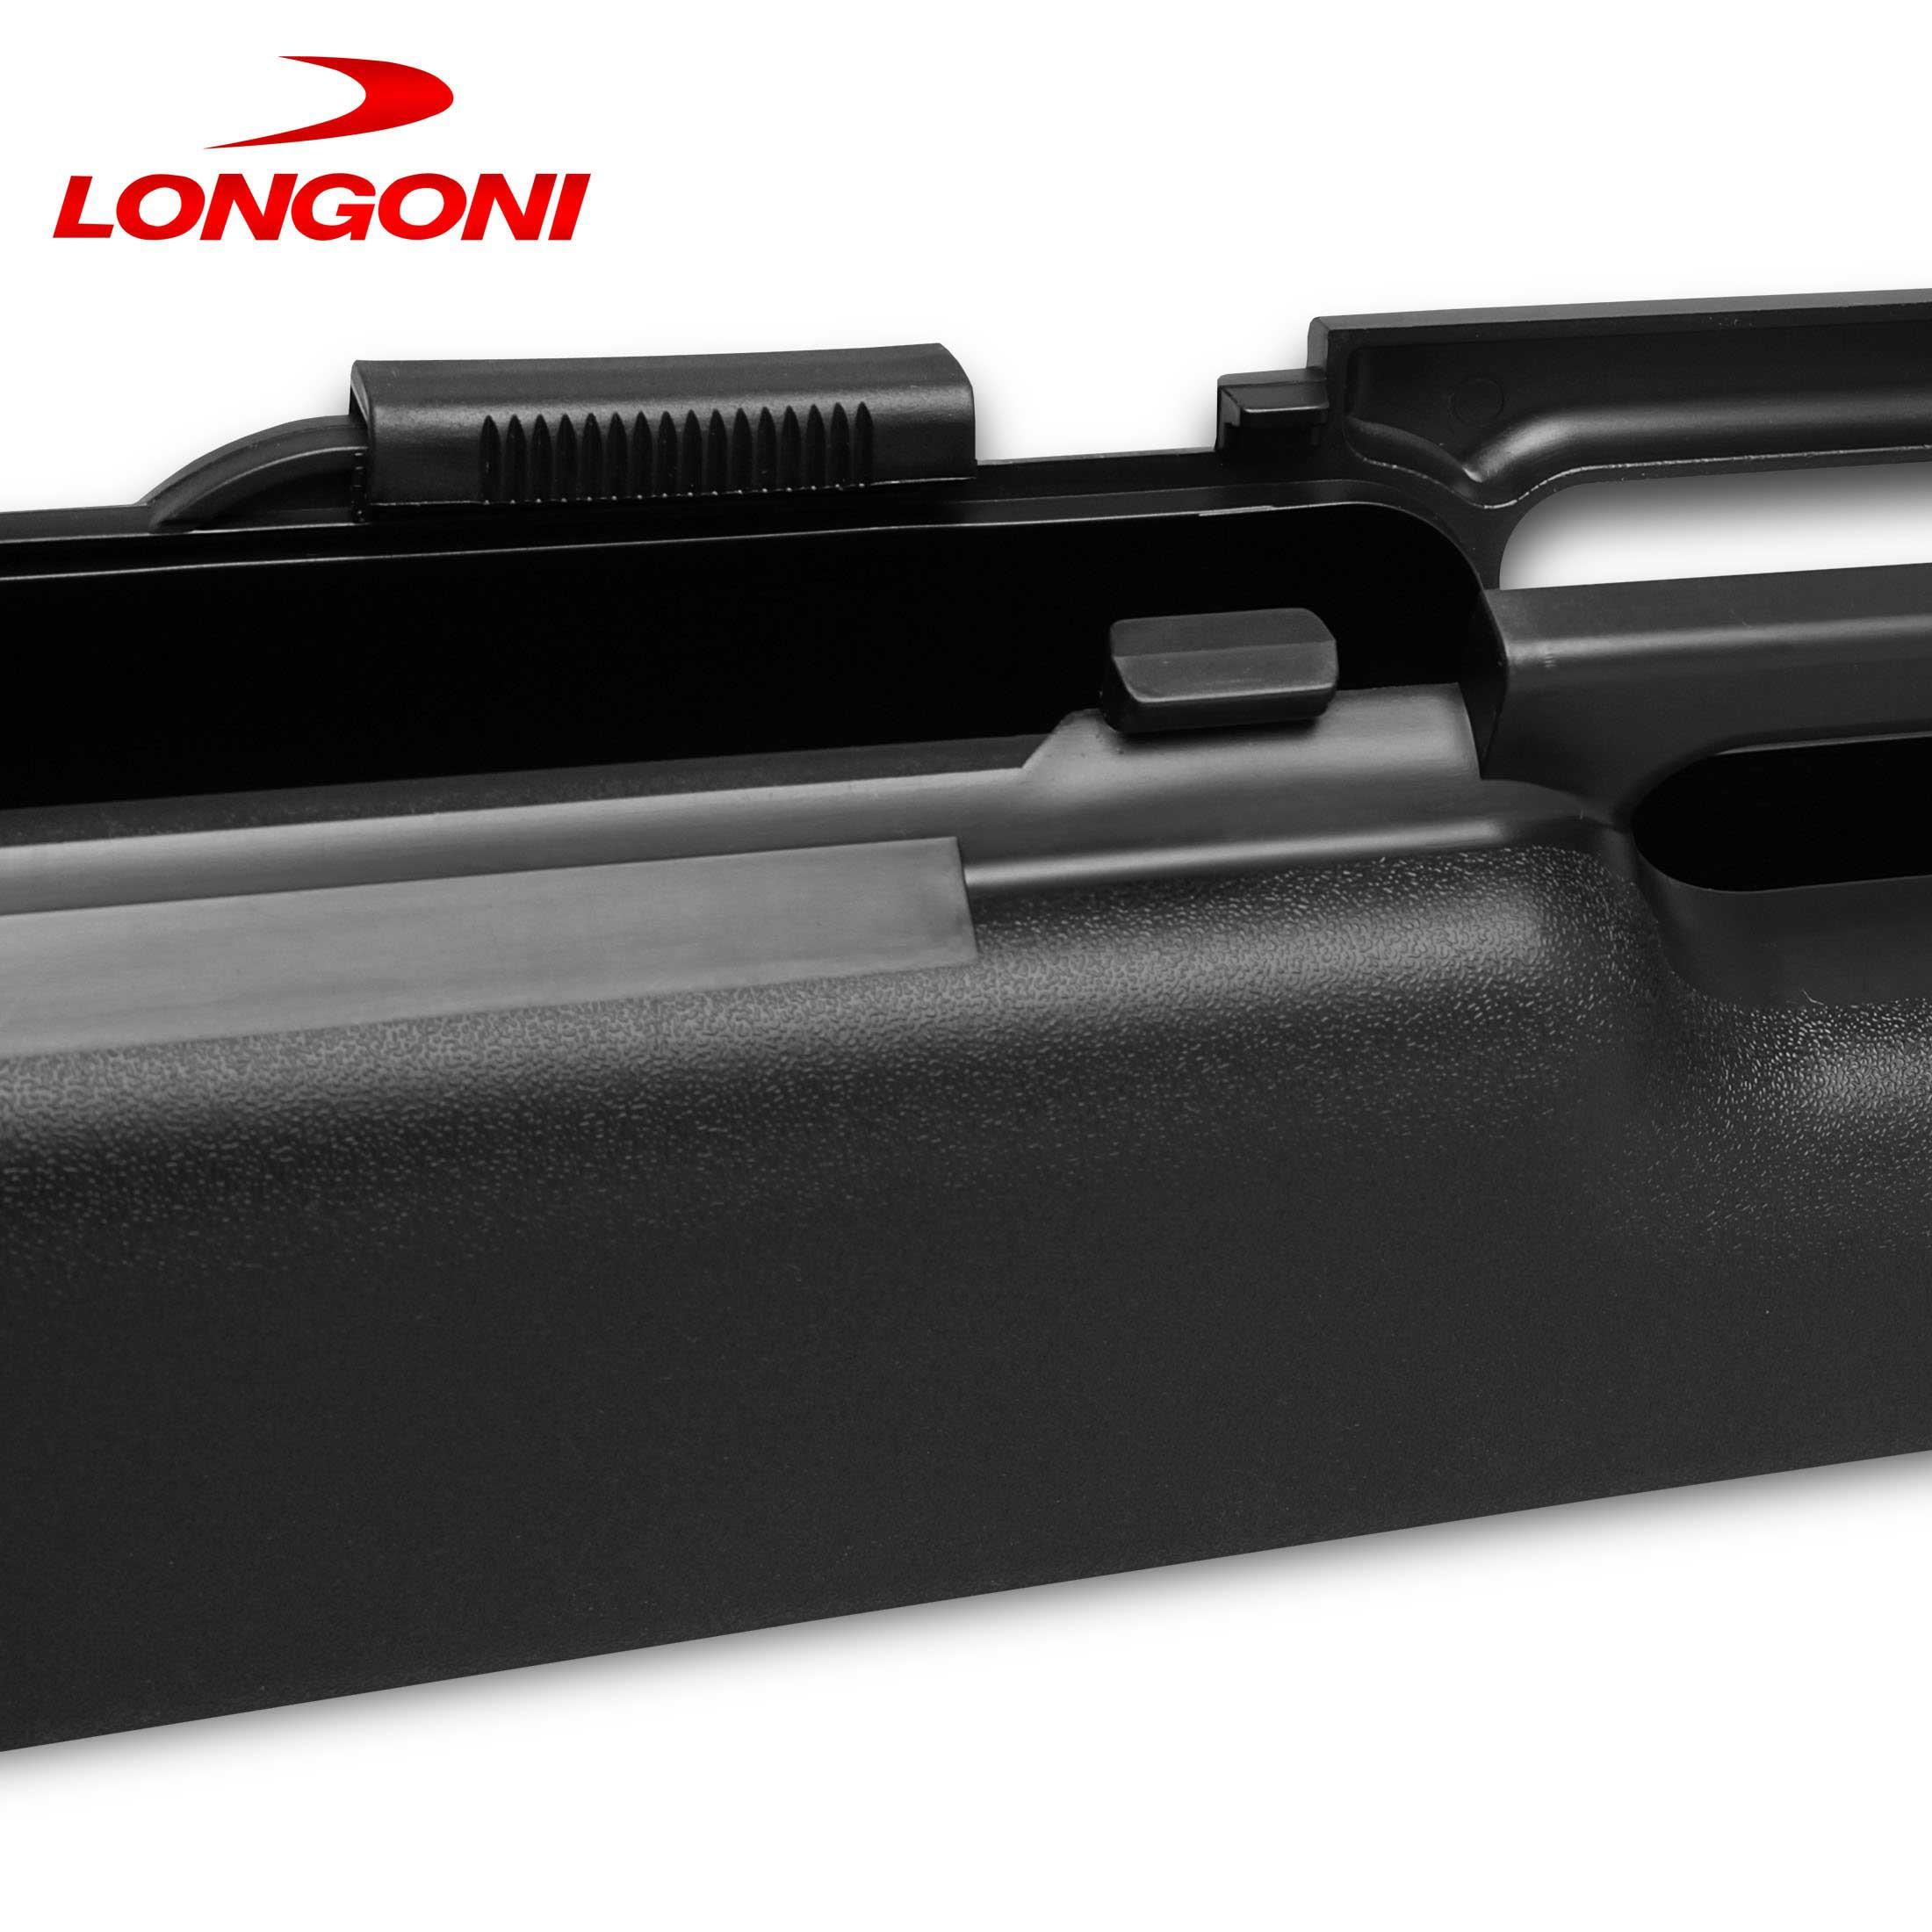 Кейс Longoni Shuttle 1x2 черный